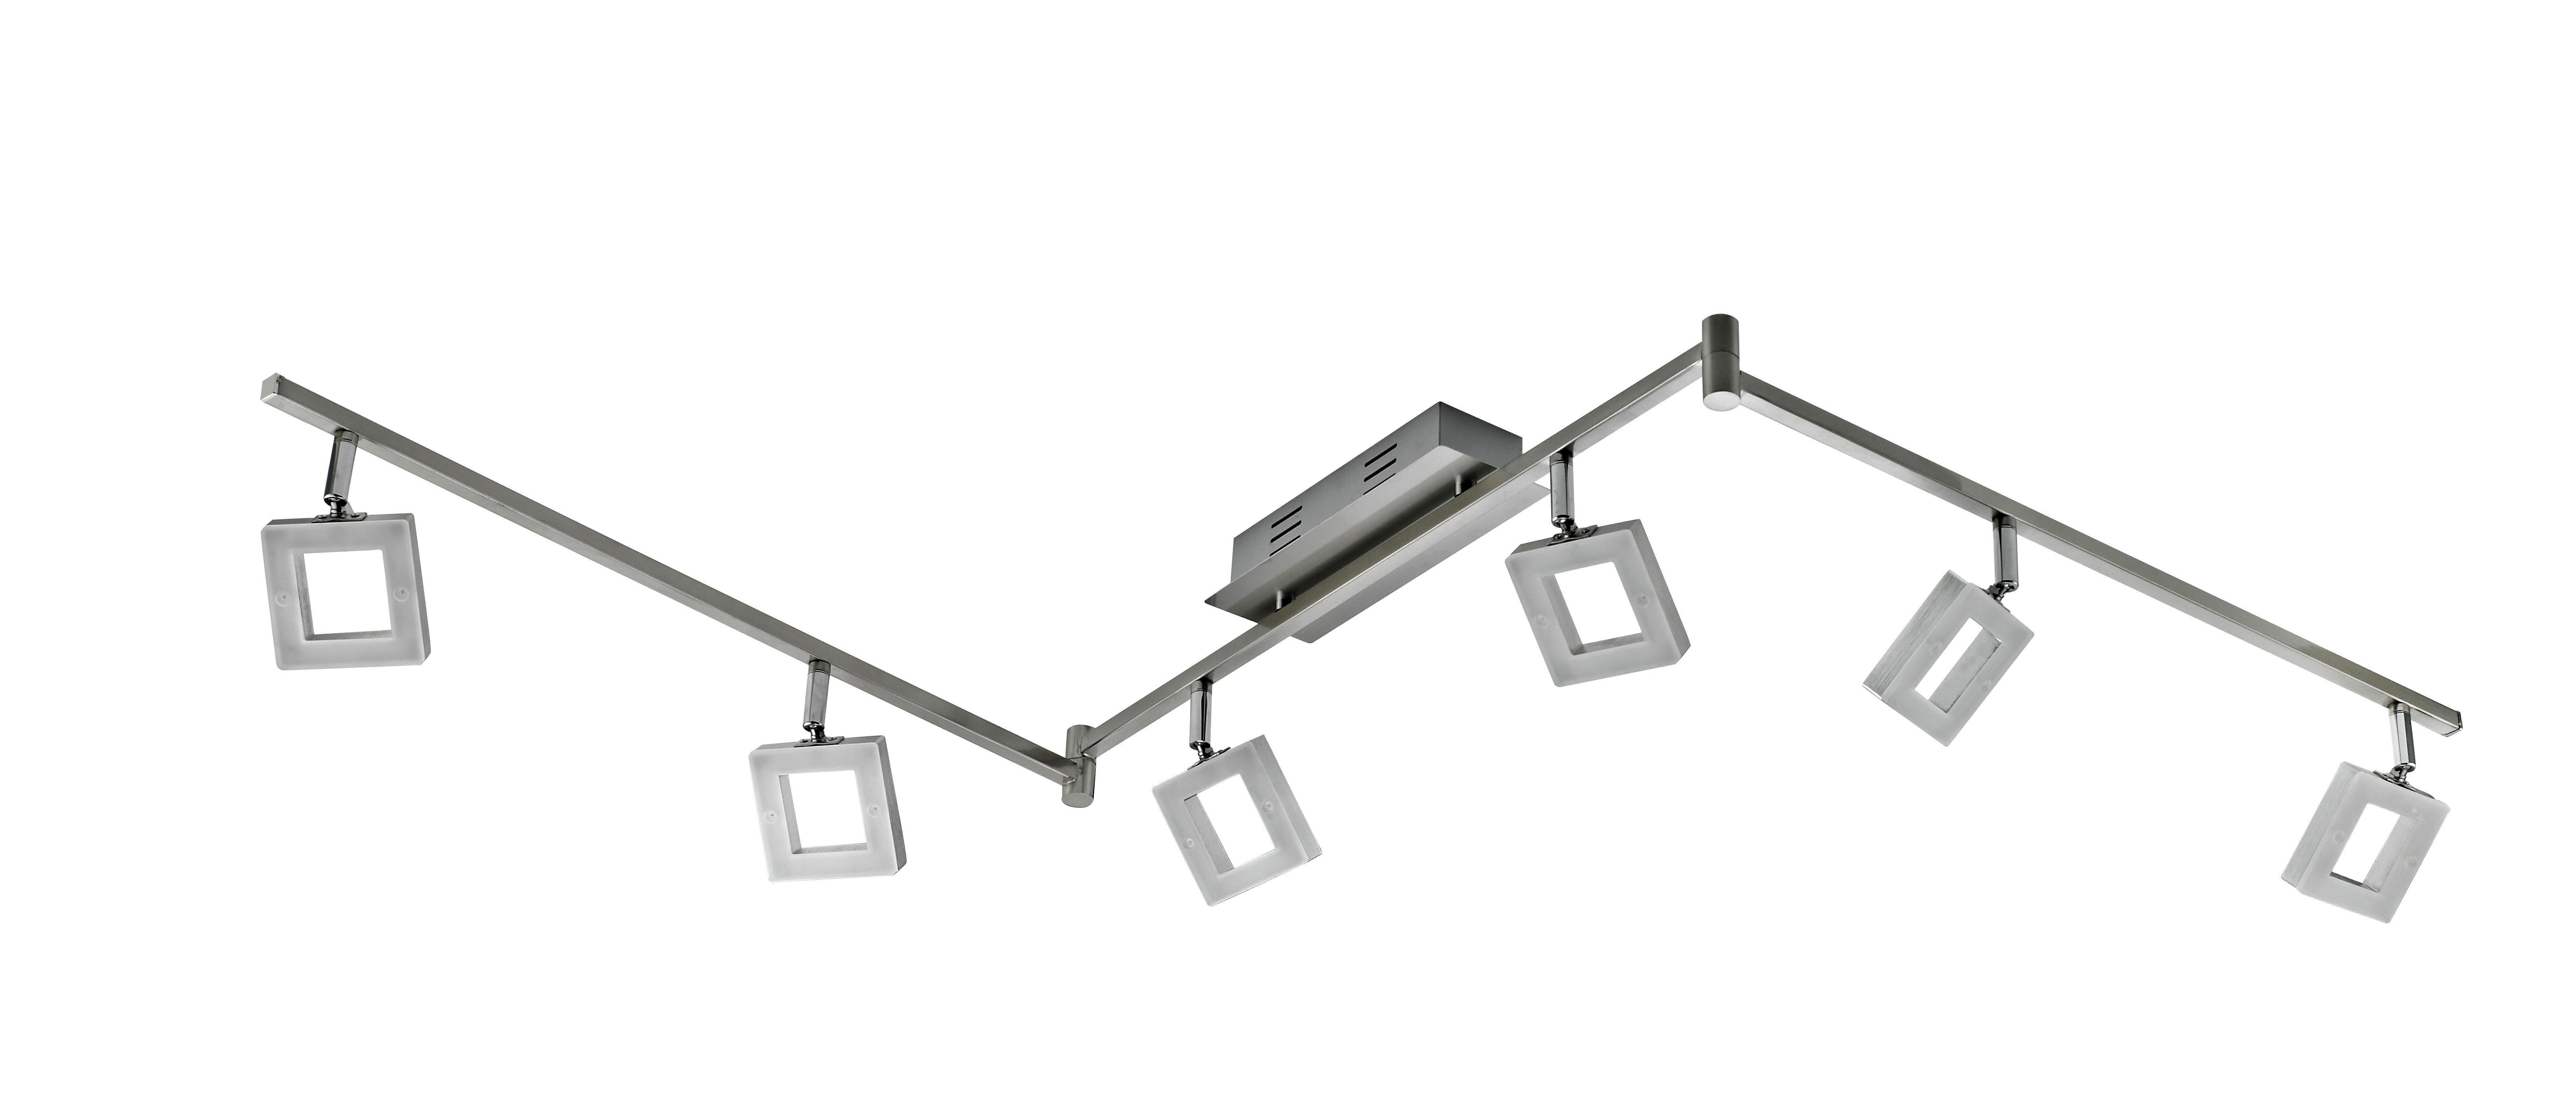 LED-STRAHLER - Chromfarben/Alufarben, Design, Kunststoff/Metall (180,5/8/21,5cm) - NOVEL